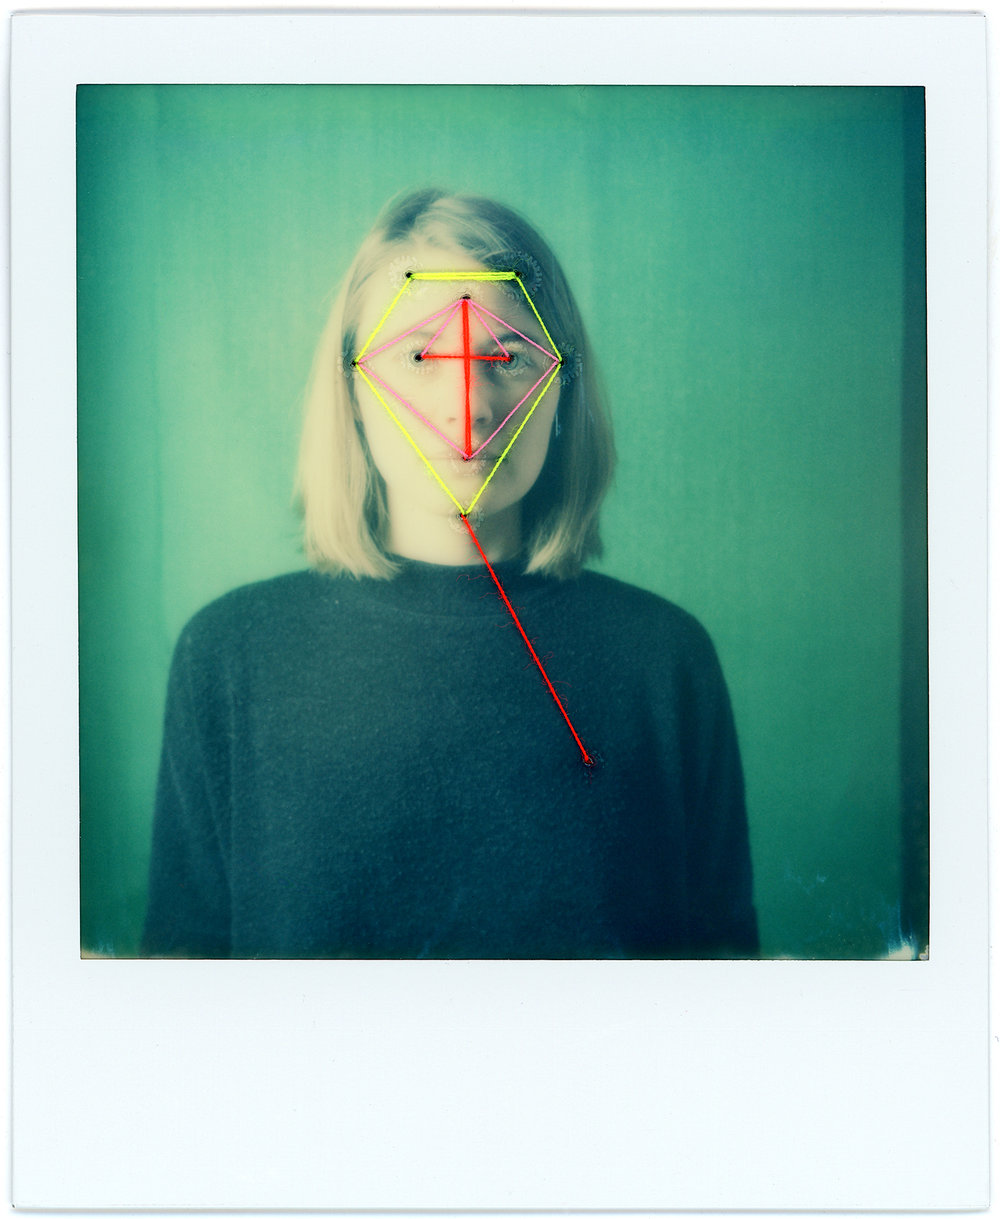 Anja's Mask | SX-70 Sonar Autofocus | Impossible Project 600 Gen3.0 | Urizen Freaza